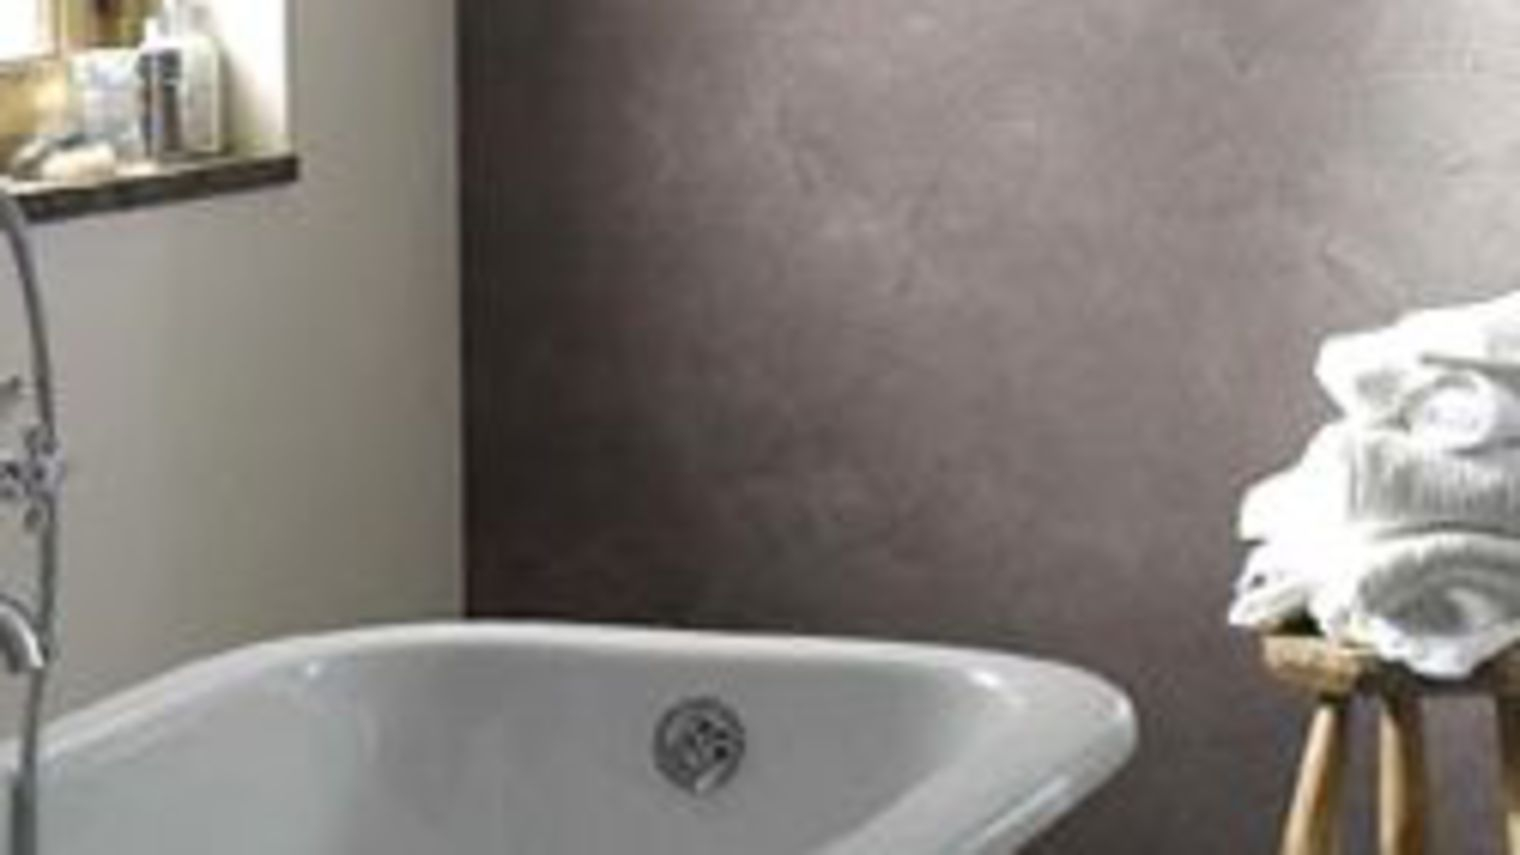 75 meilleur de photos de carrelage adh sif salle de bain. Black Bedroom Furniture Sets. Home Design Ideas